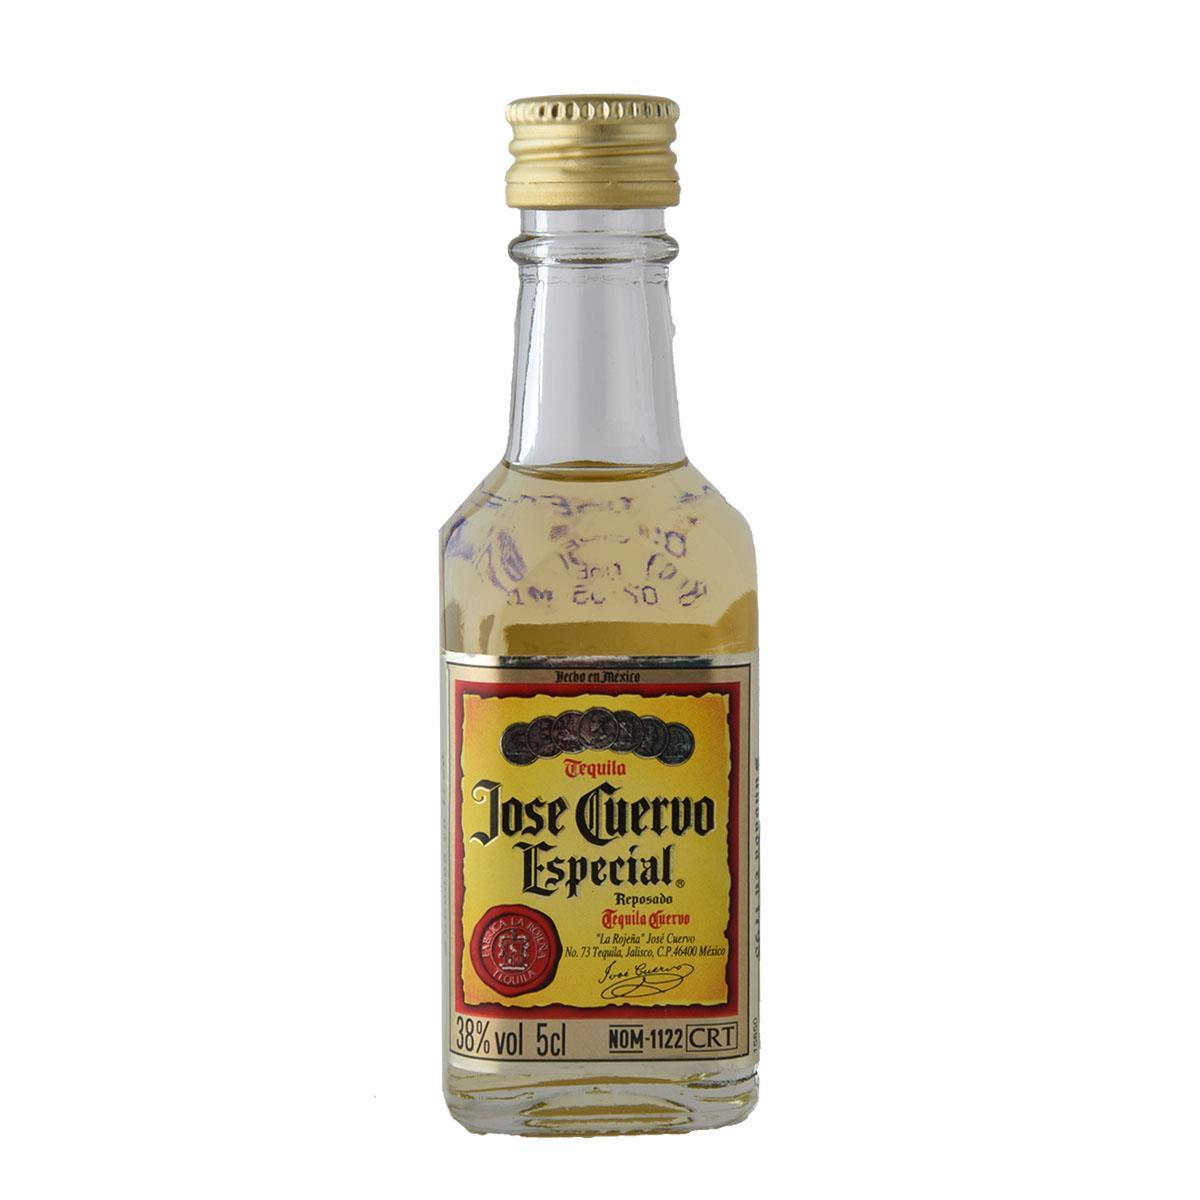 Jose Cuervo Reposado Tequila 50ml